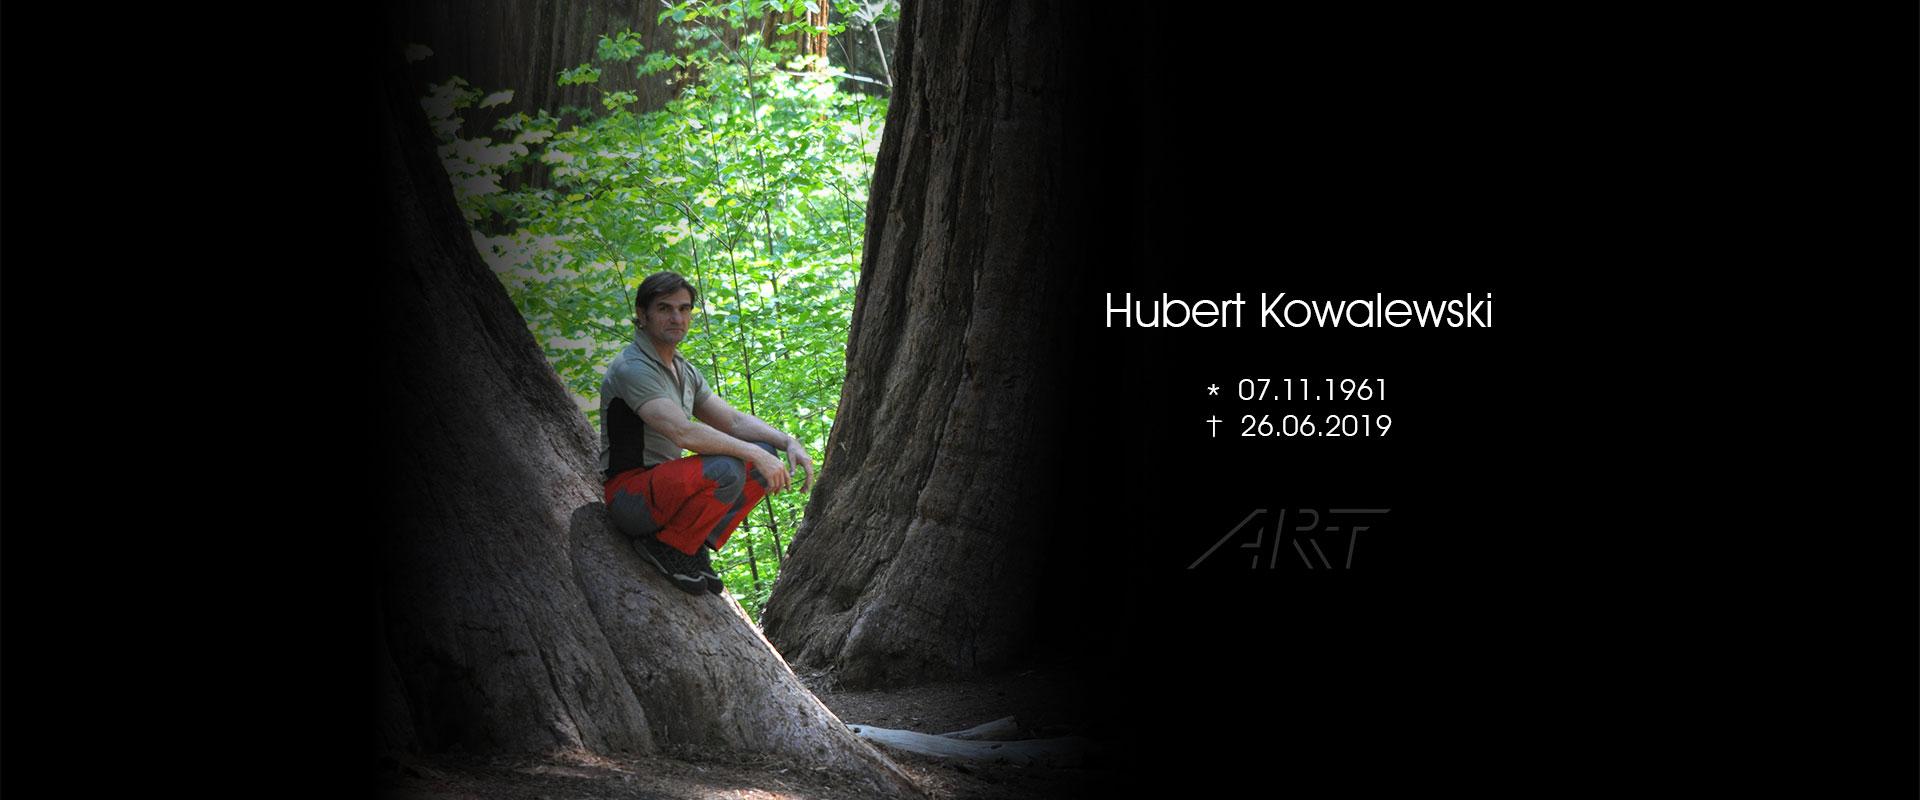 Hubert Kowalewski